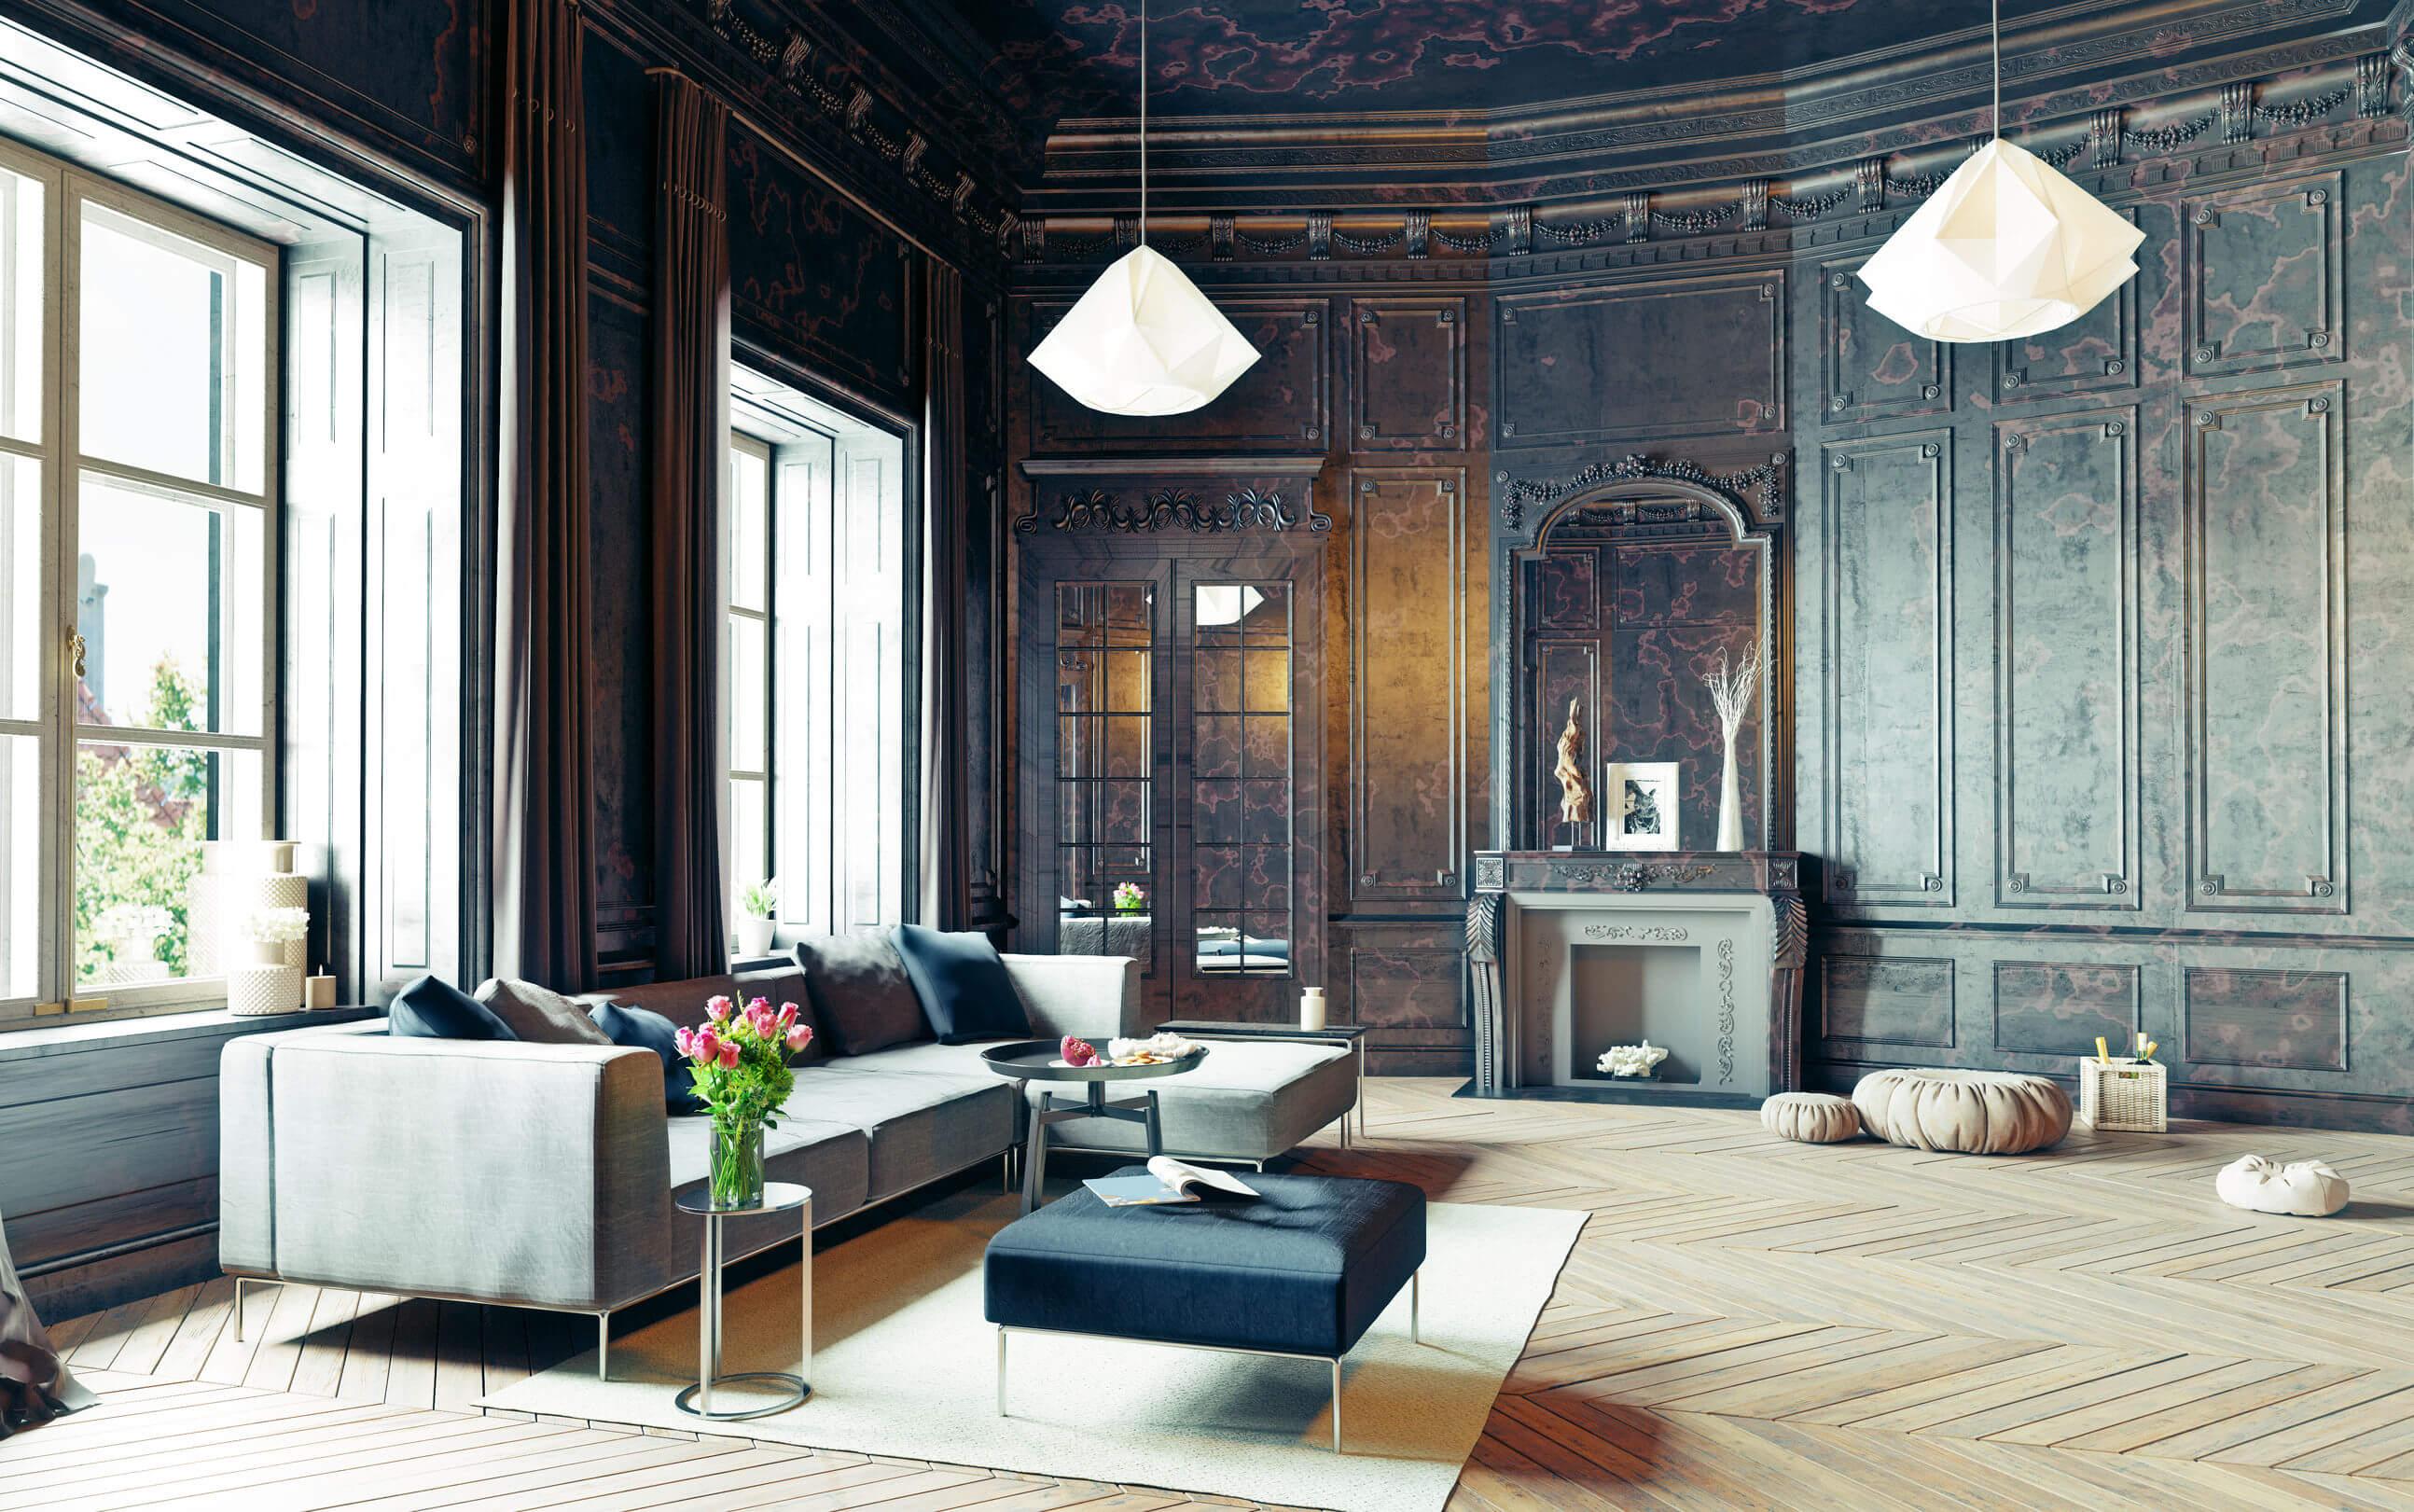 Budapesti magazinlakások gyönyörű nappalival!